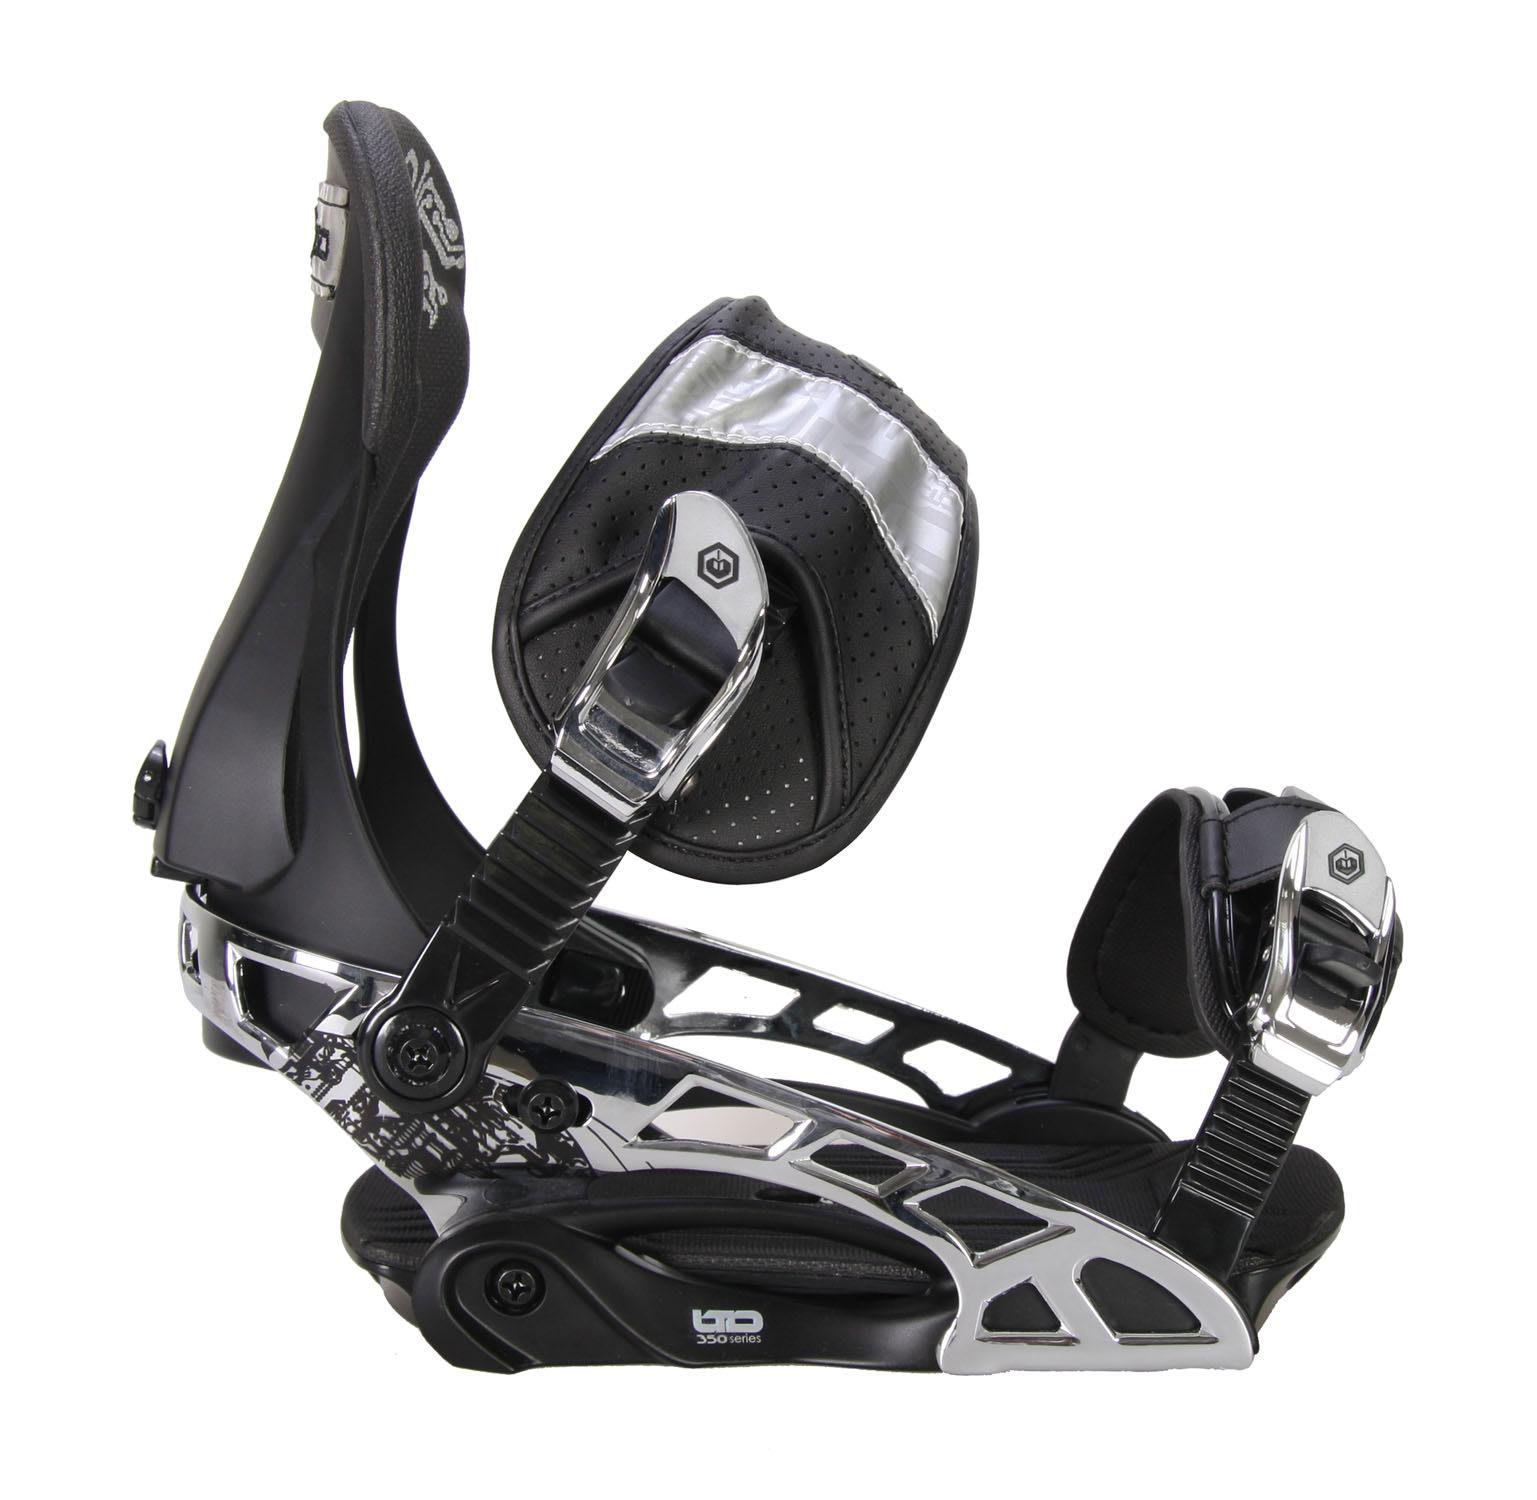 LTD LT350 Snowboard Bindings